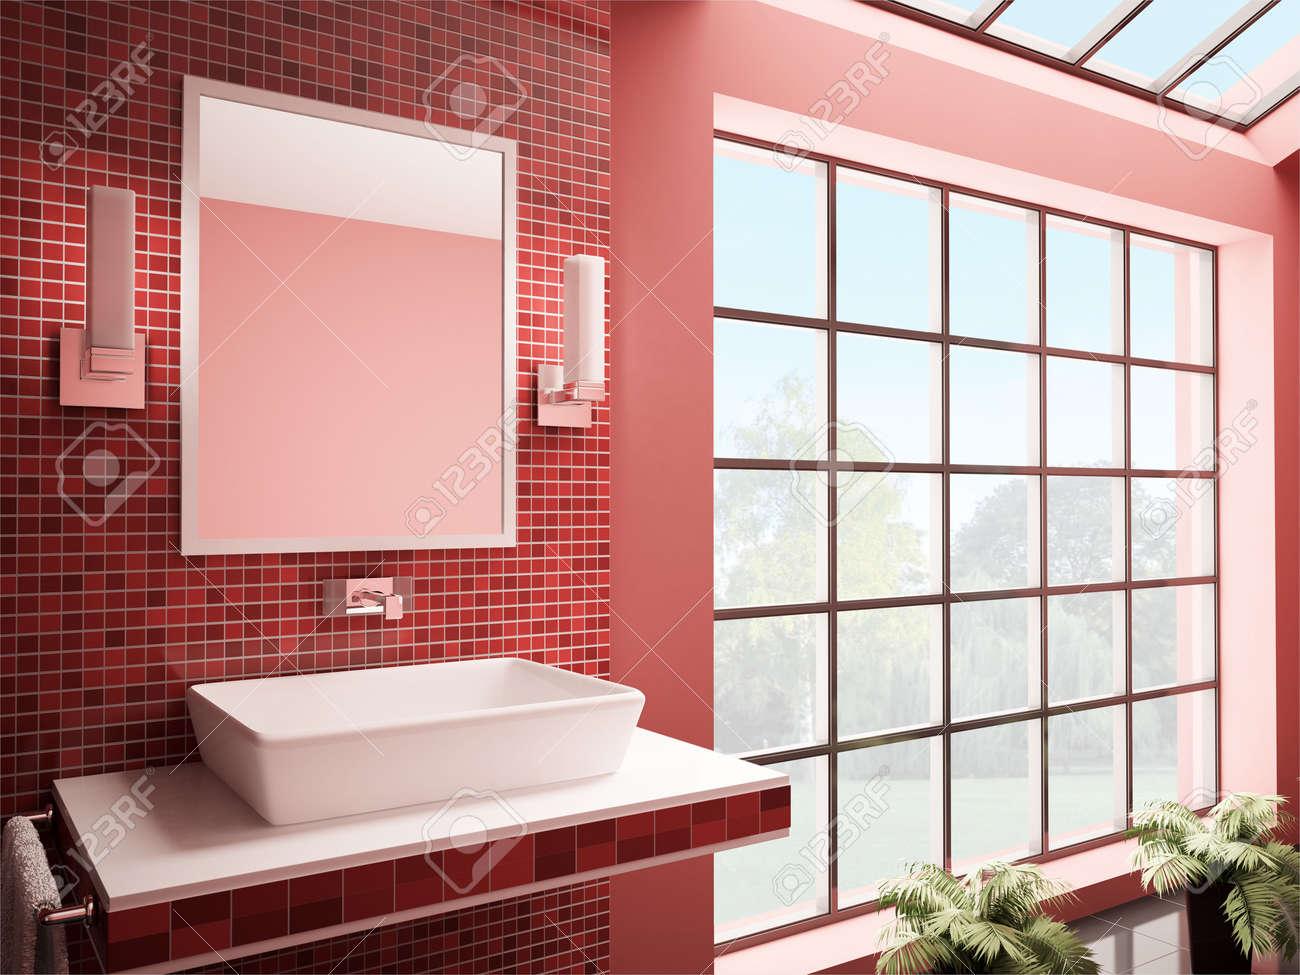 Red Bathroom With Big Window Interior 3d Render Stock Photo